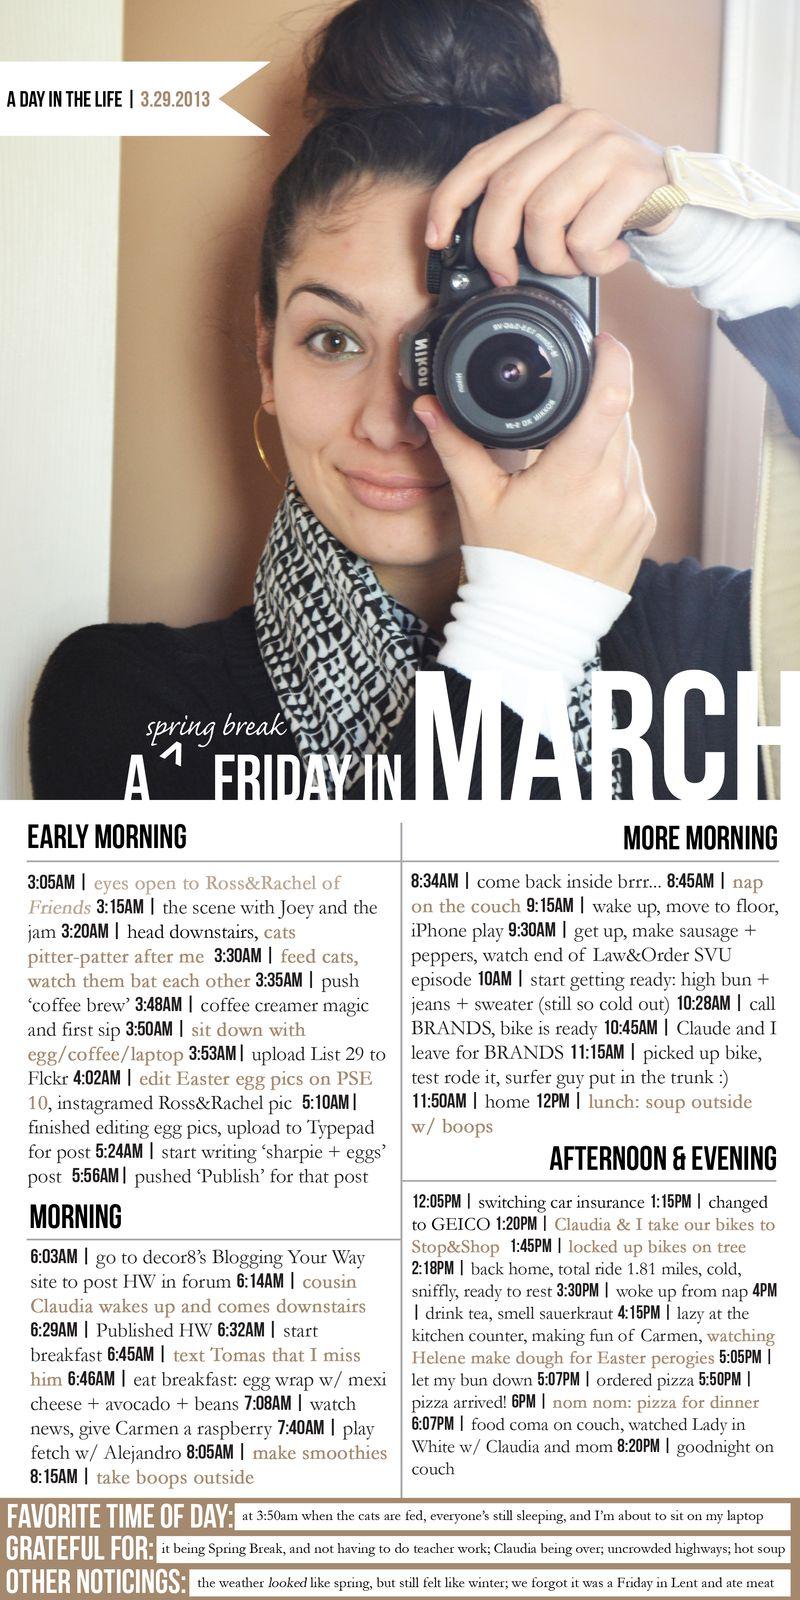 AEdwards_DayInTheLife6x12_March_edited-1